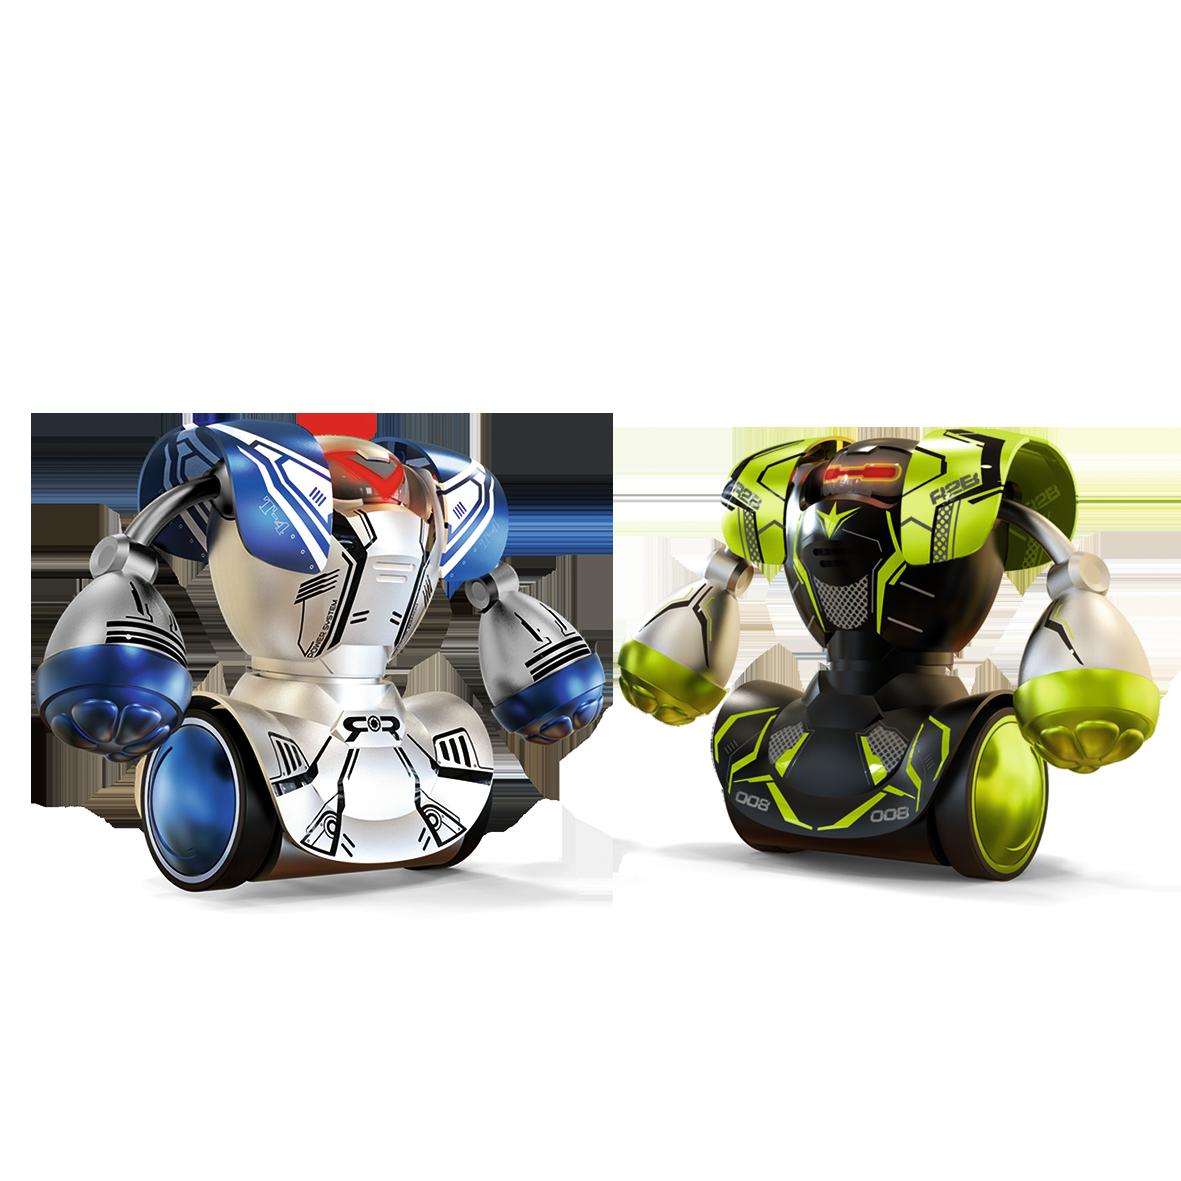 Robo Kombat Twin